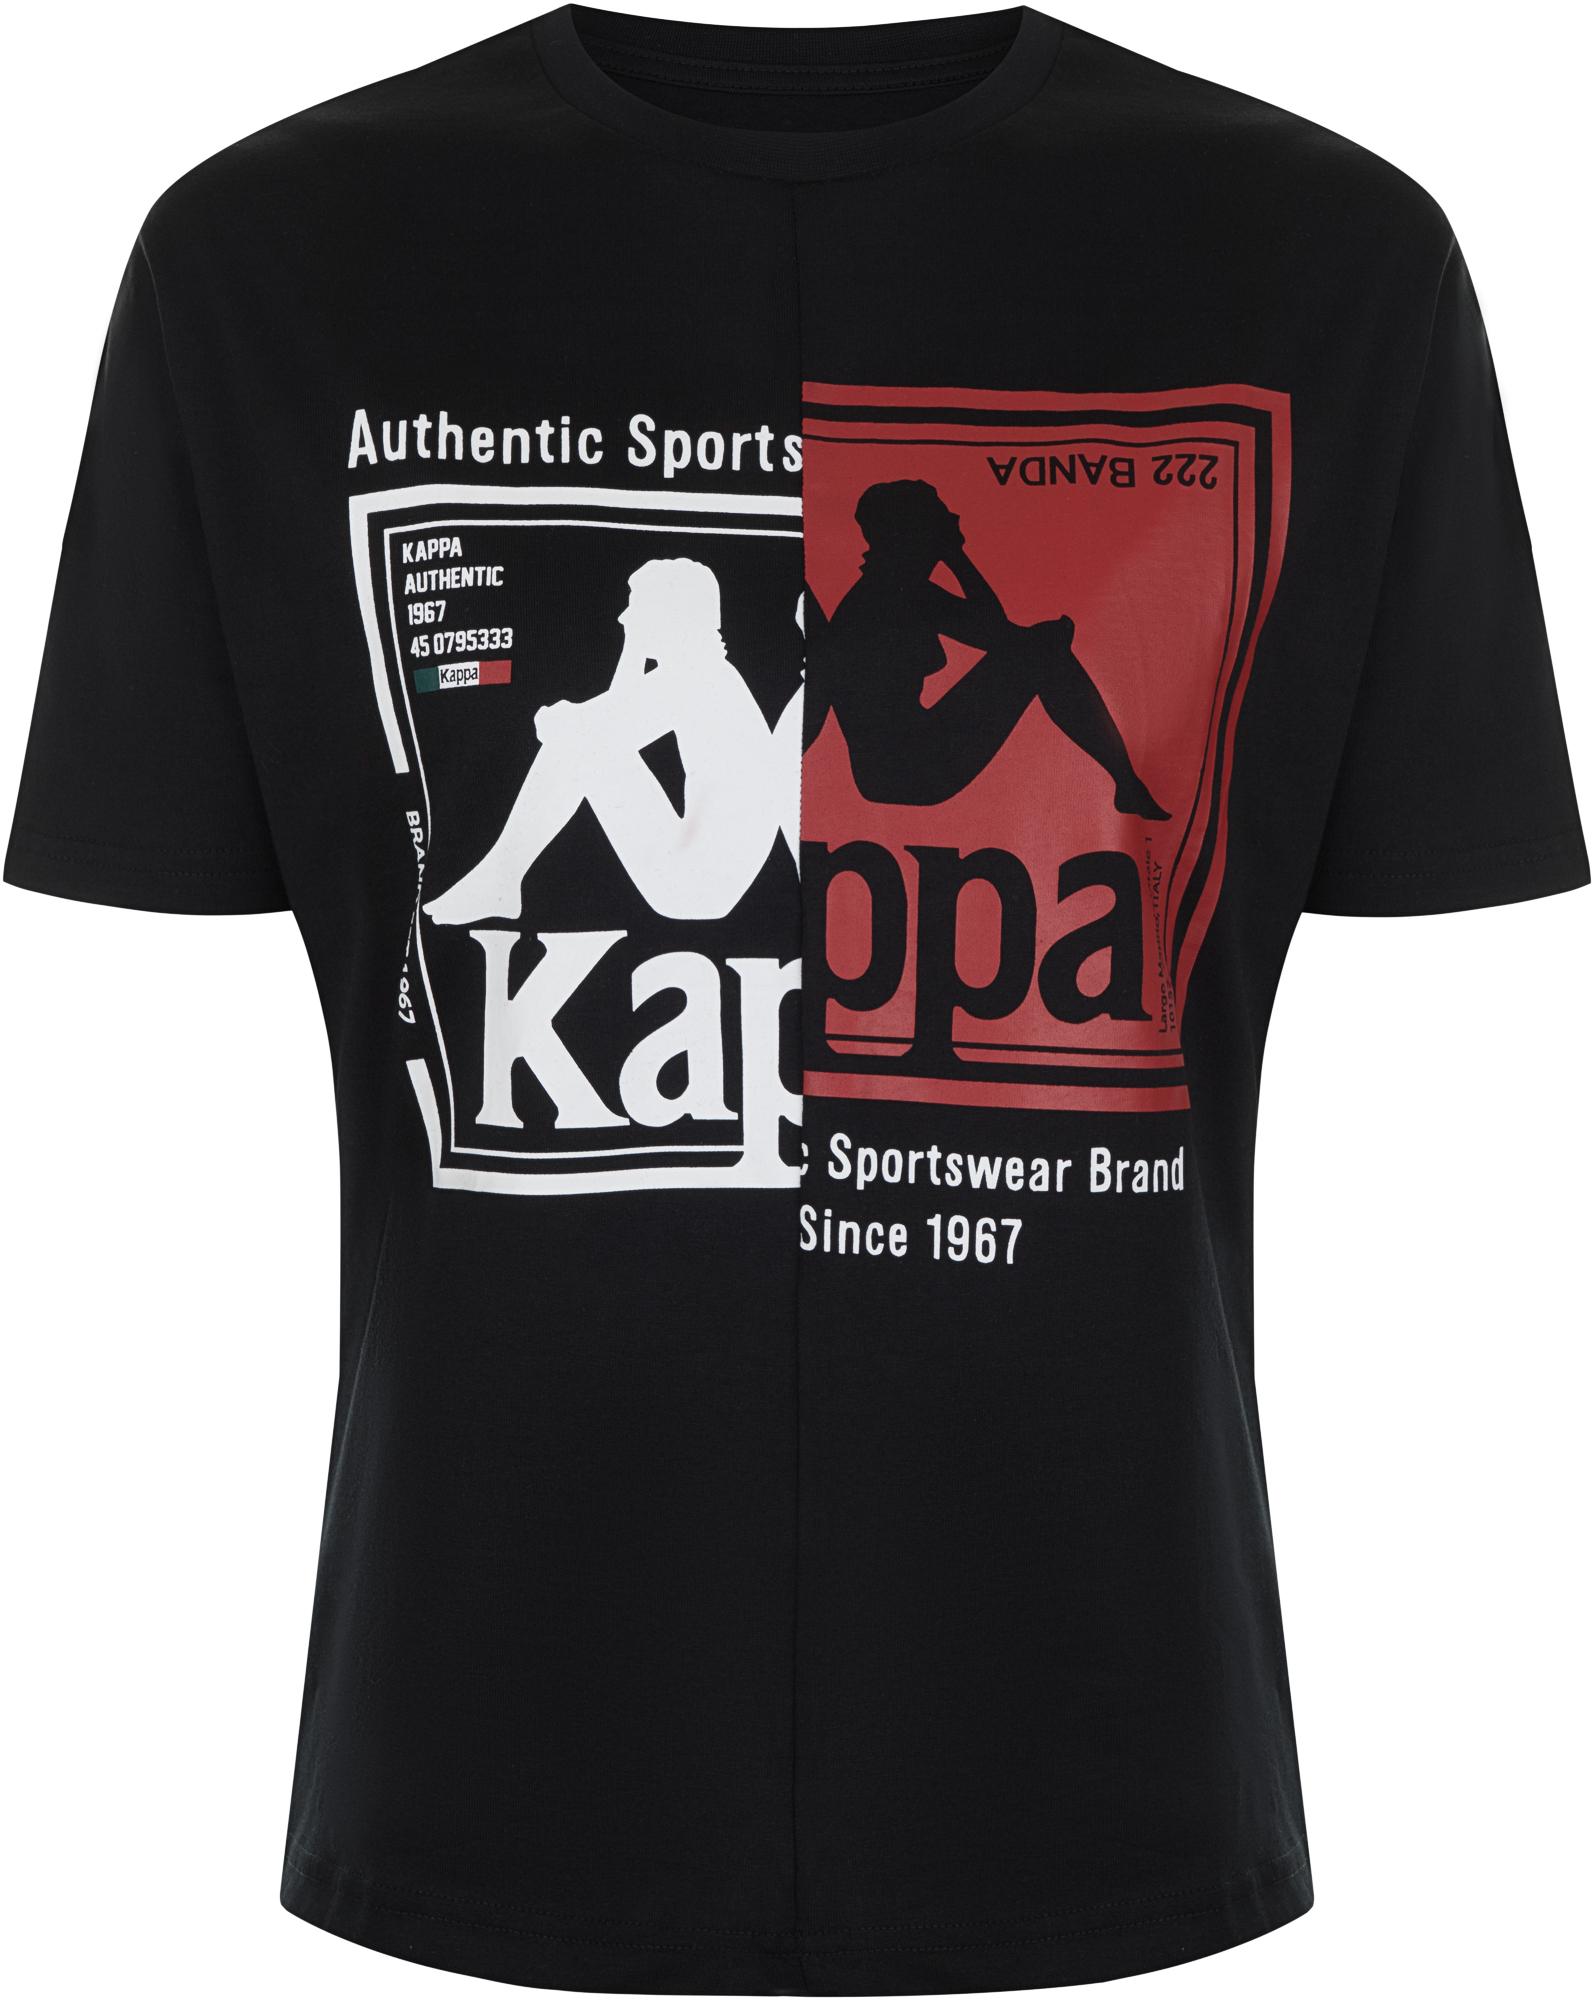 Kappa Футболка женская Kappa, размер 42 цена